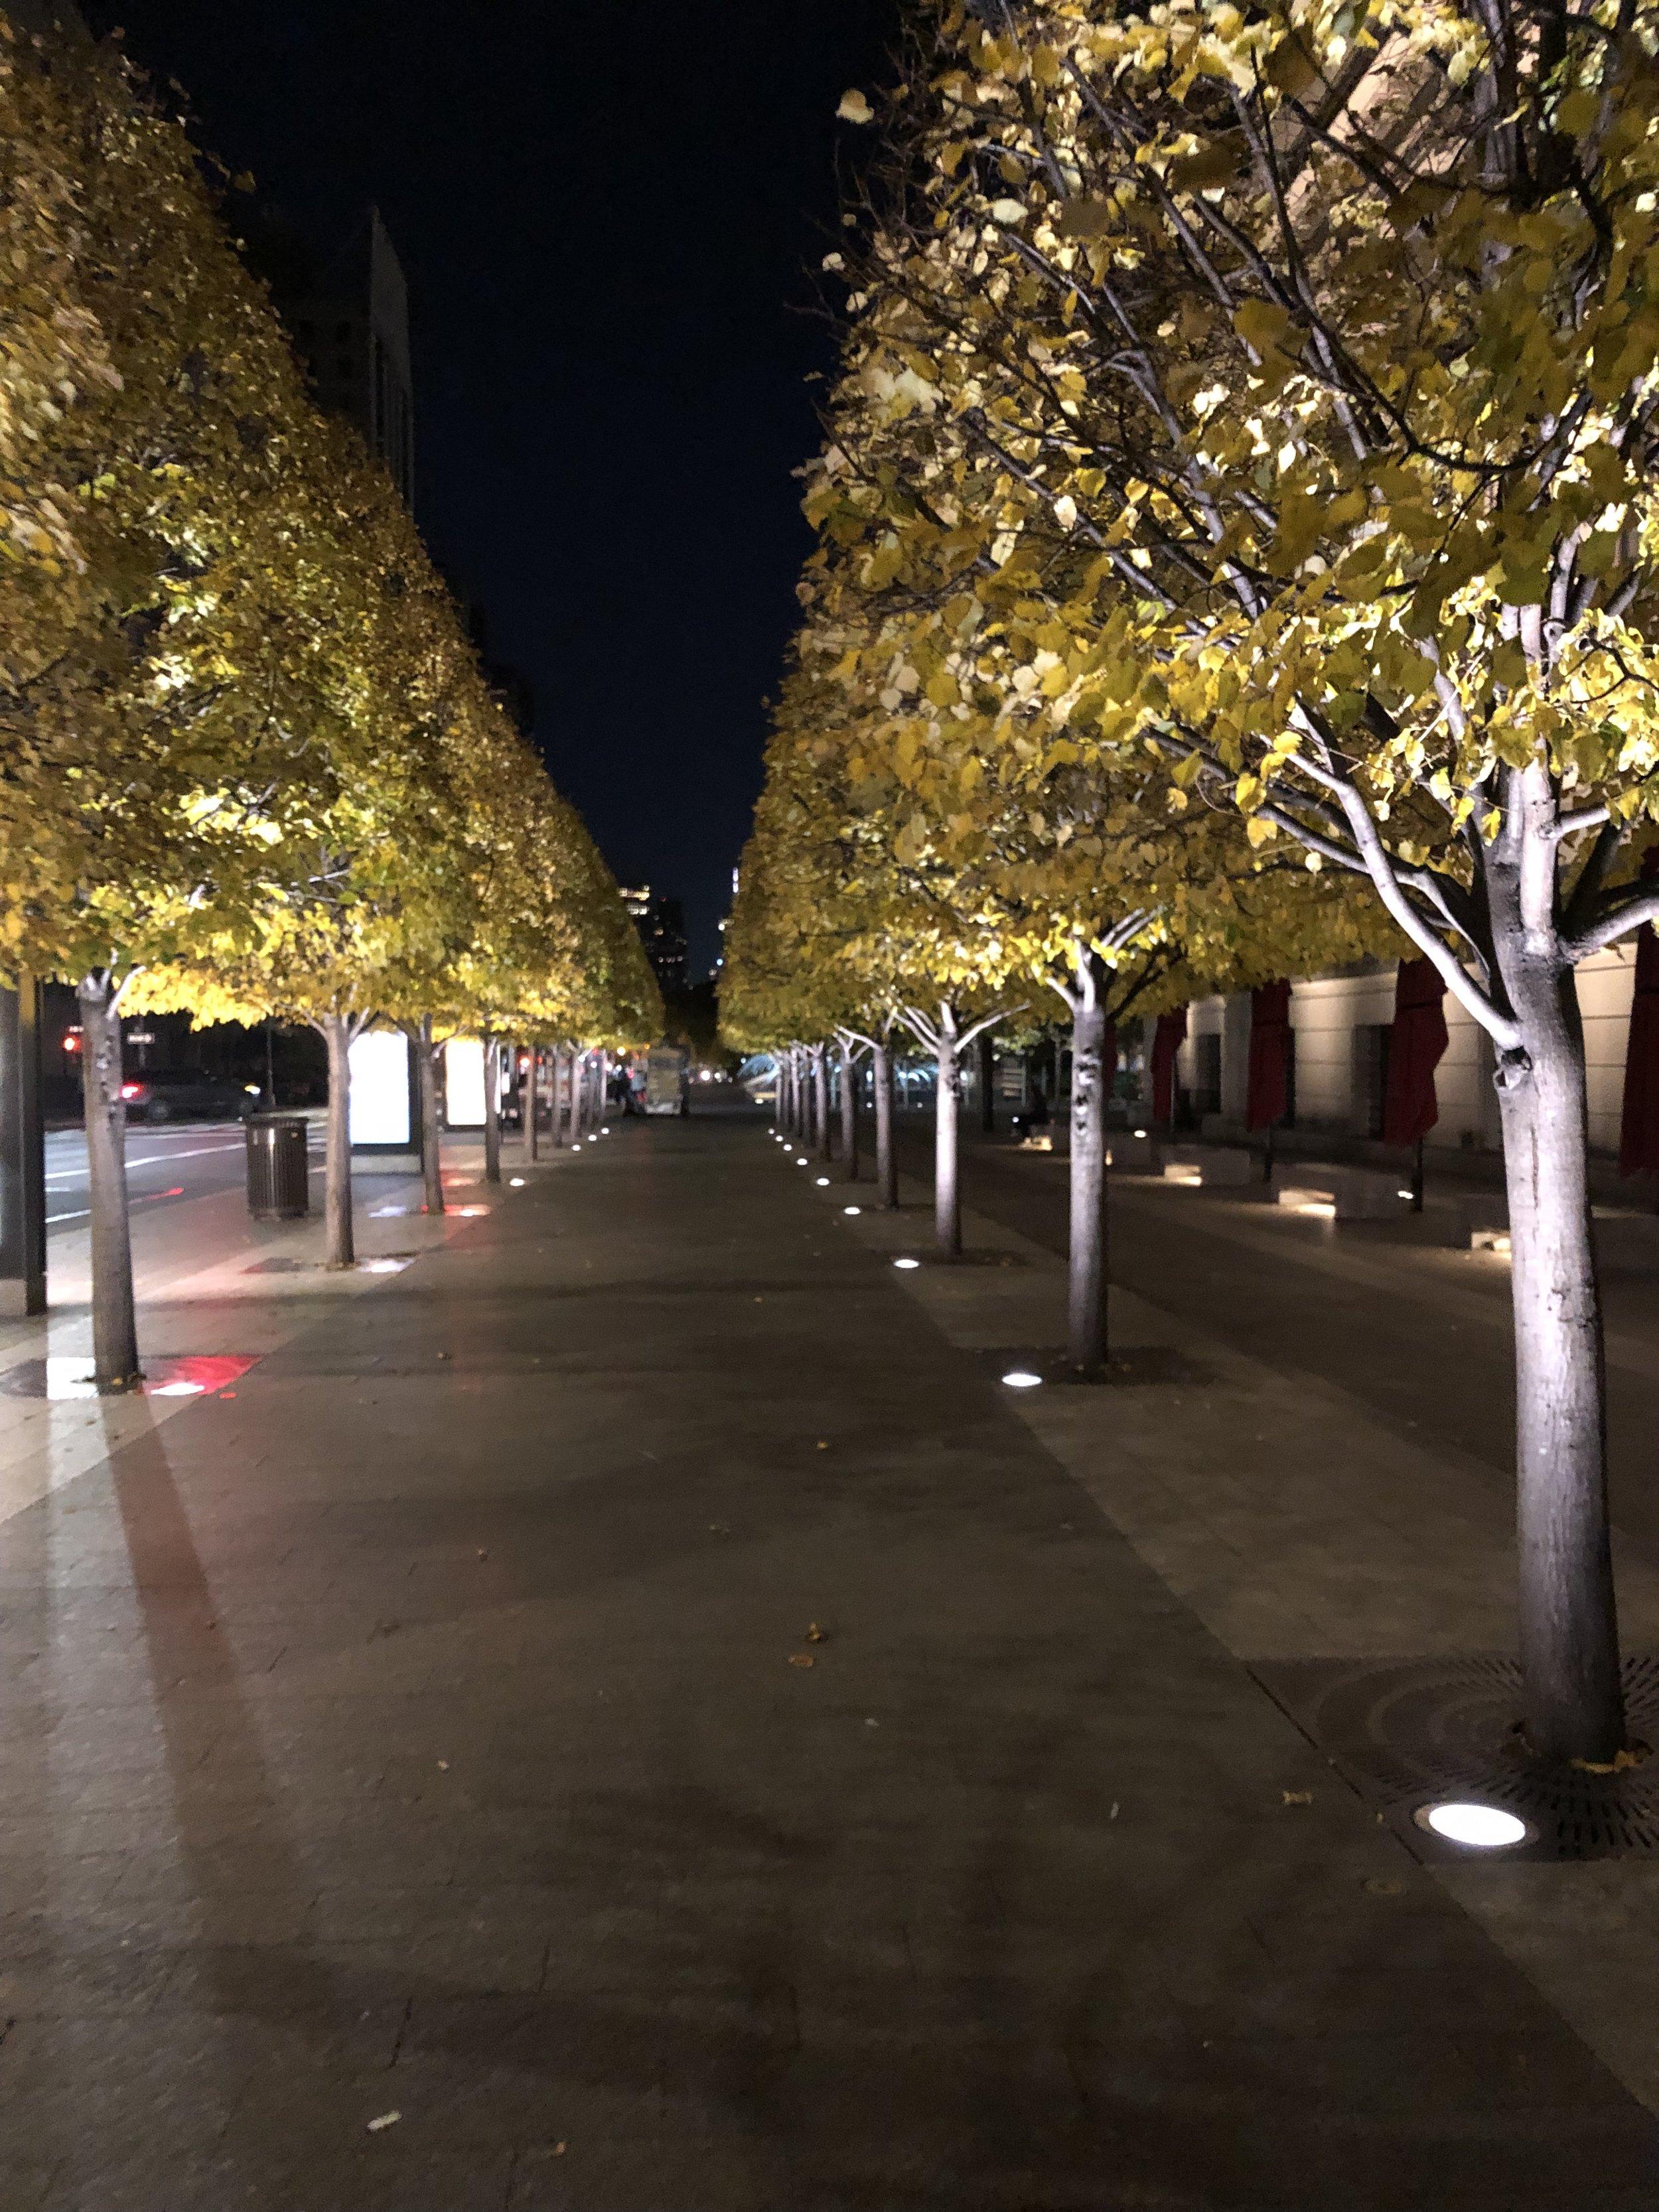 A stroll through NYC at night